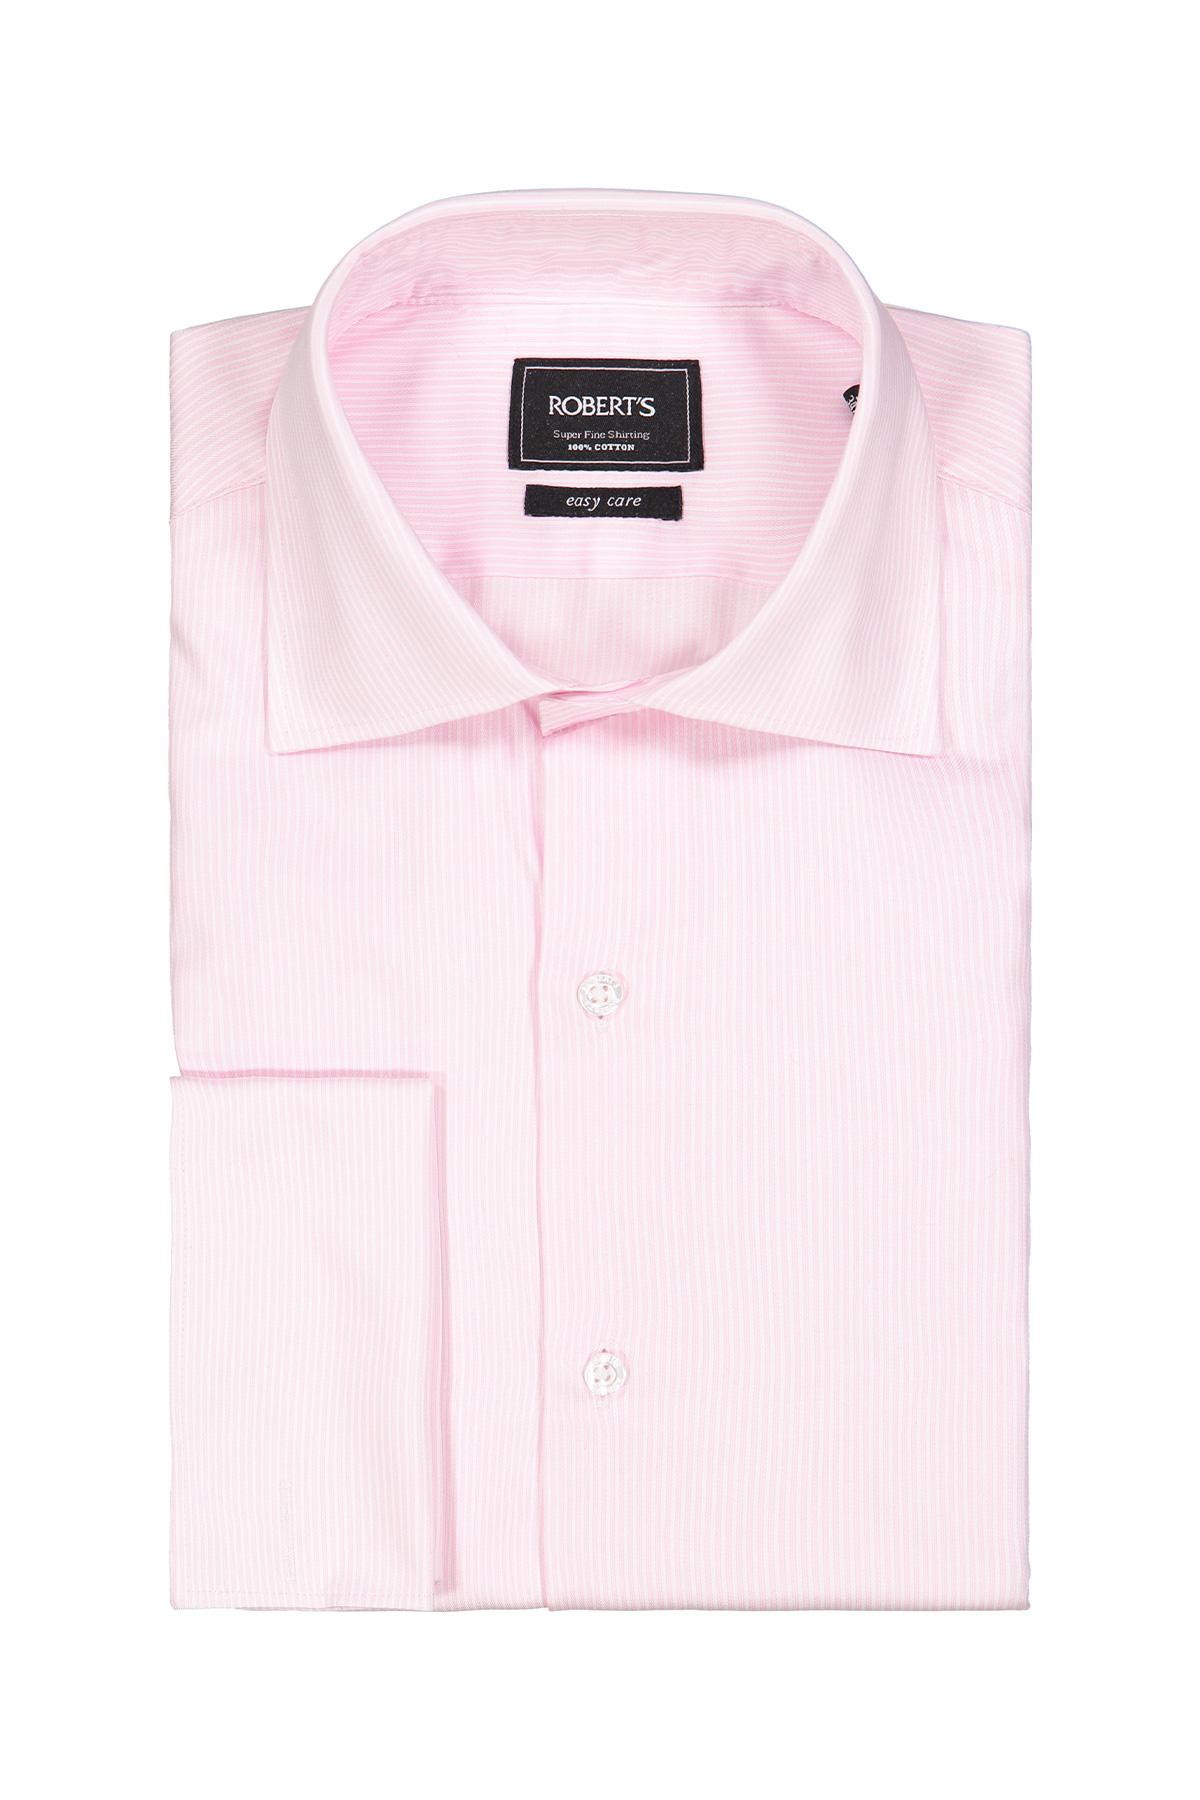 Camisa Robert´s, Easy Care, rayada color rosa, puño doble.